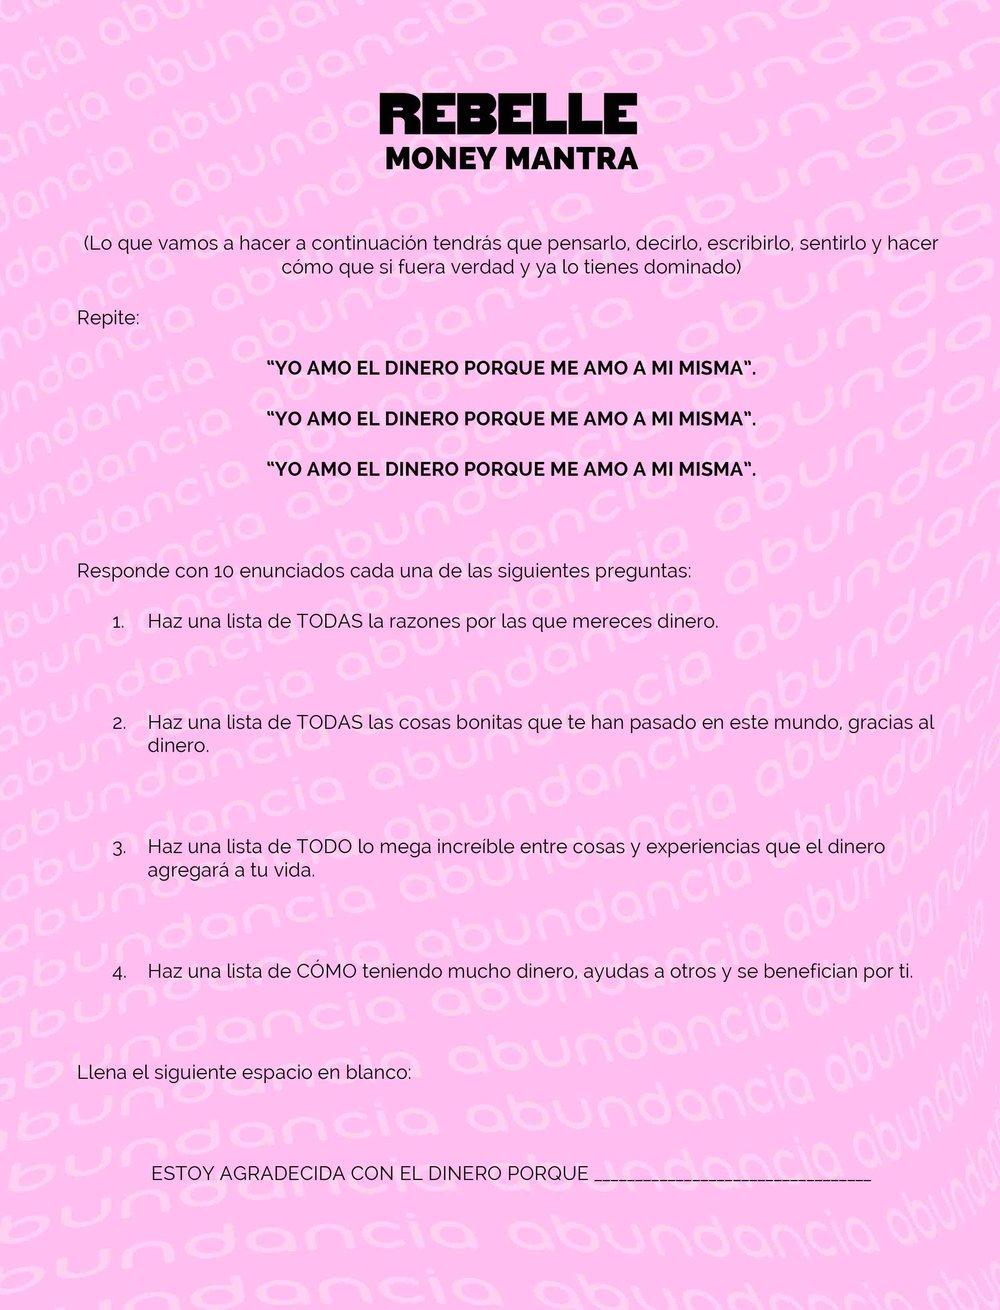 MONEY MANTRA REBELLE_low.jpg